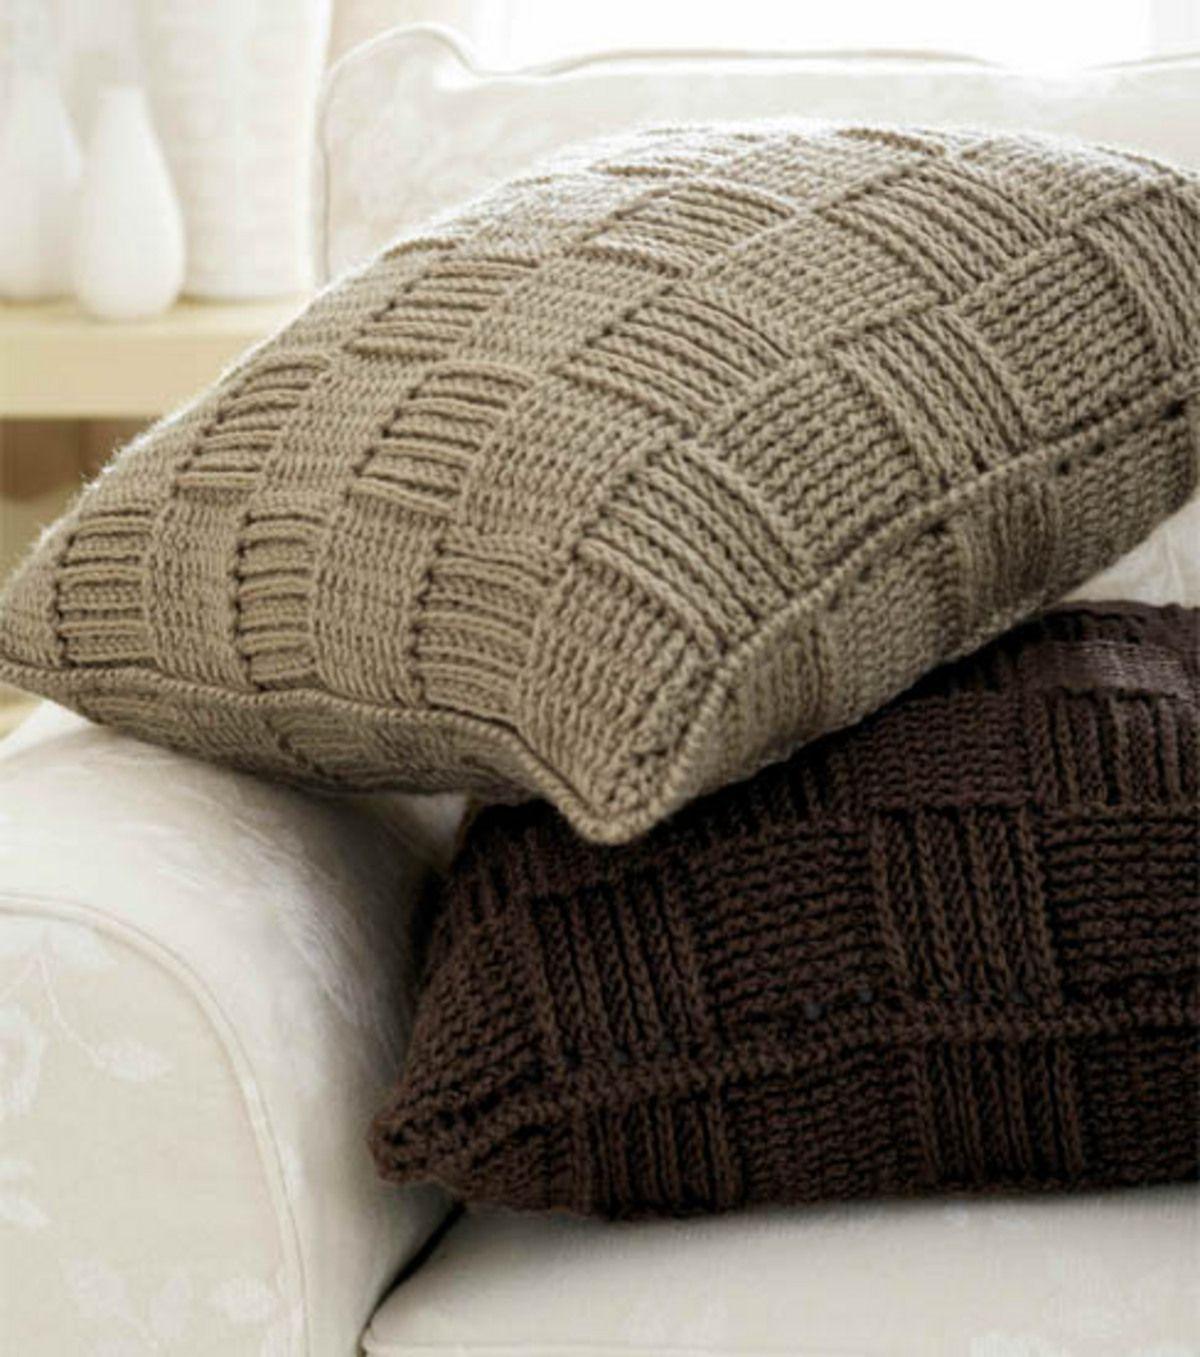 DIY Crochet Throw Pillows | FREE Pattern available at Joann.com ...